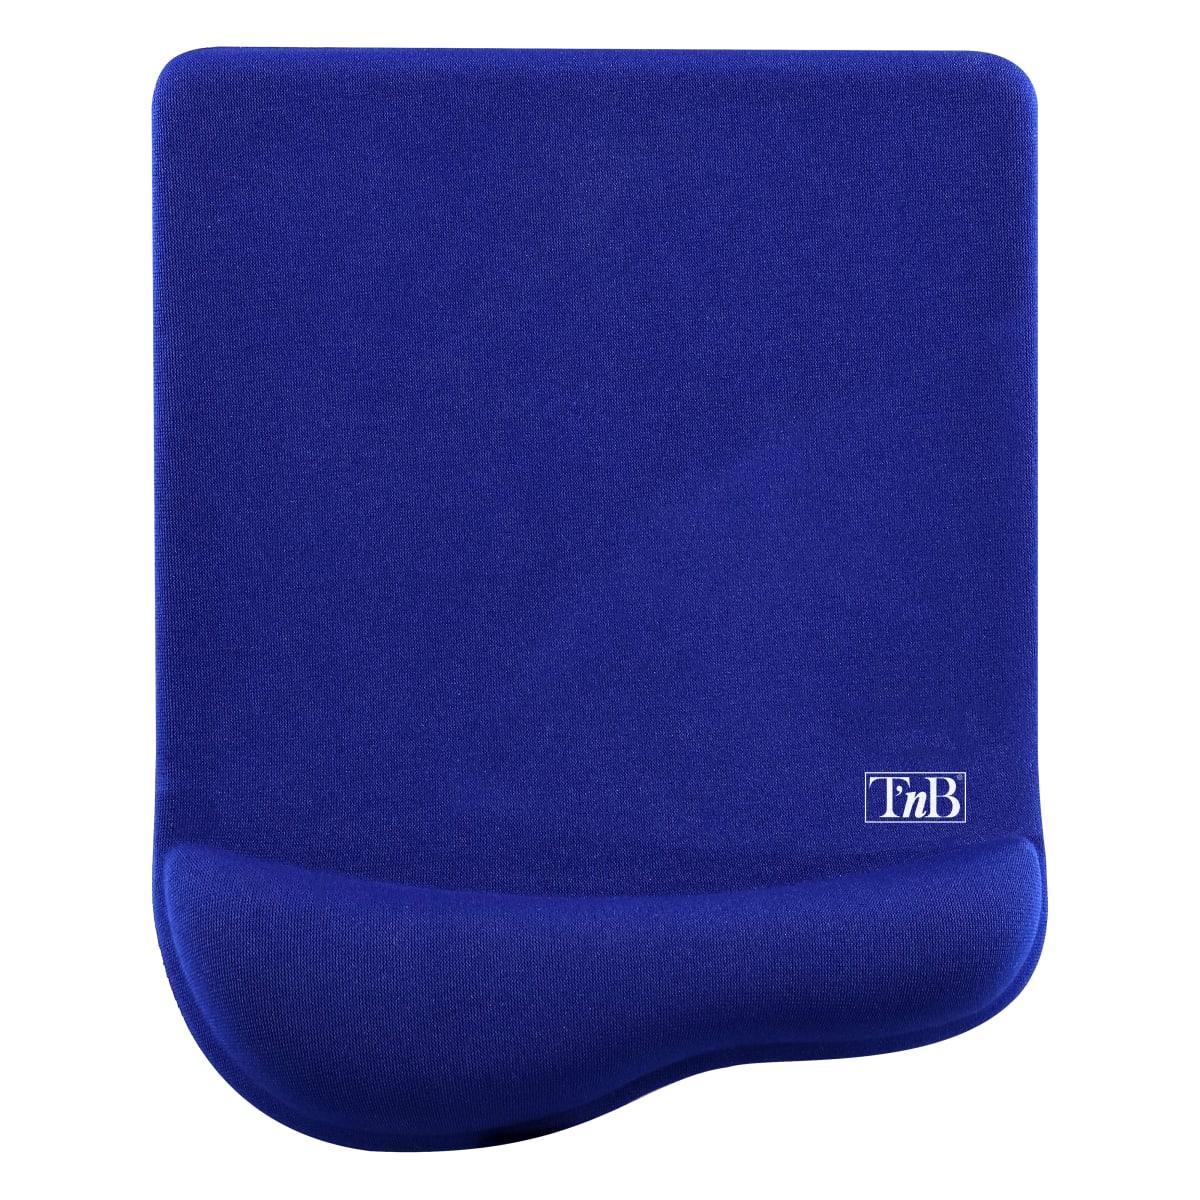 Ergonomic blue antimicrobial gel mouse pad